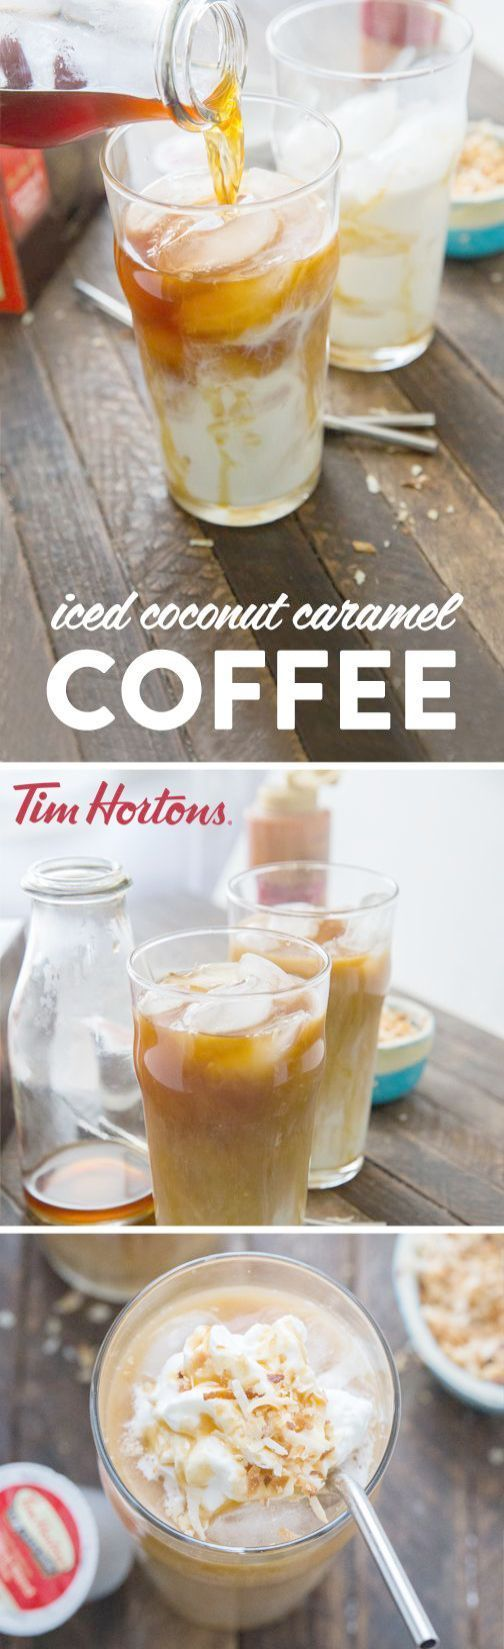 Kaffeemaschine Single Serve Rund Costa Coffee In Meiner Nahe Jobs Out Coffee Table Run Tasty Coffee Recipes Coffee Costa Essen Rezepte Kochrezepte